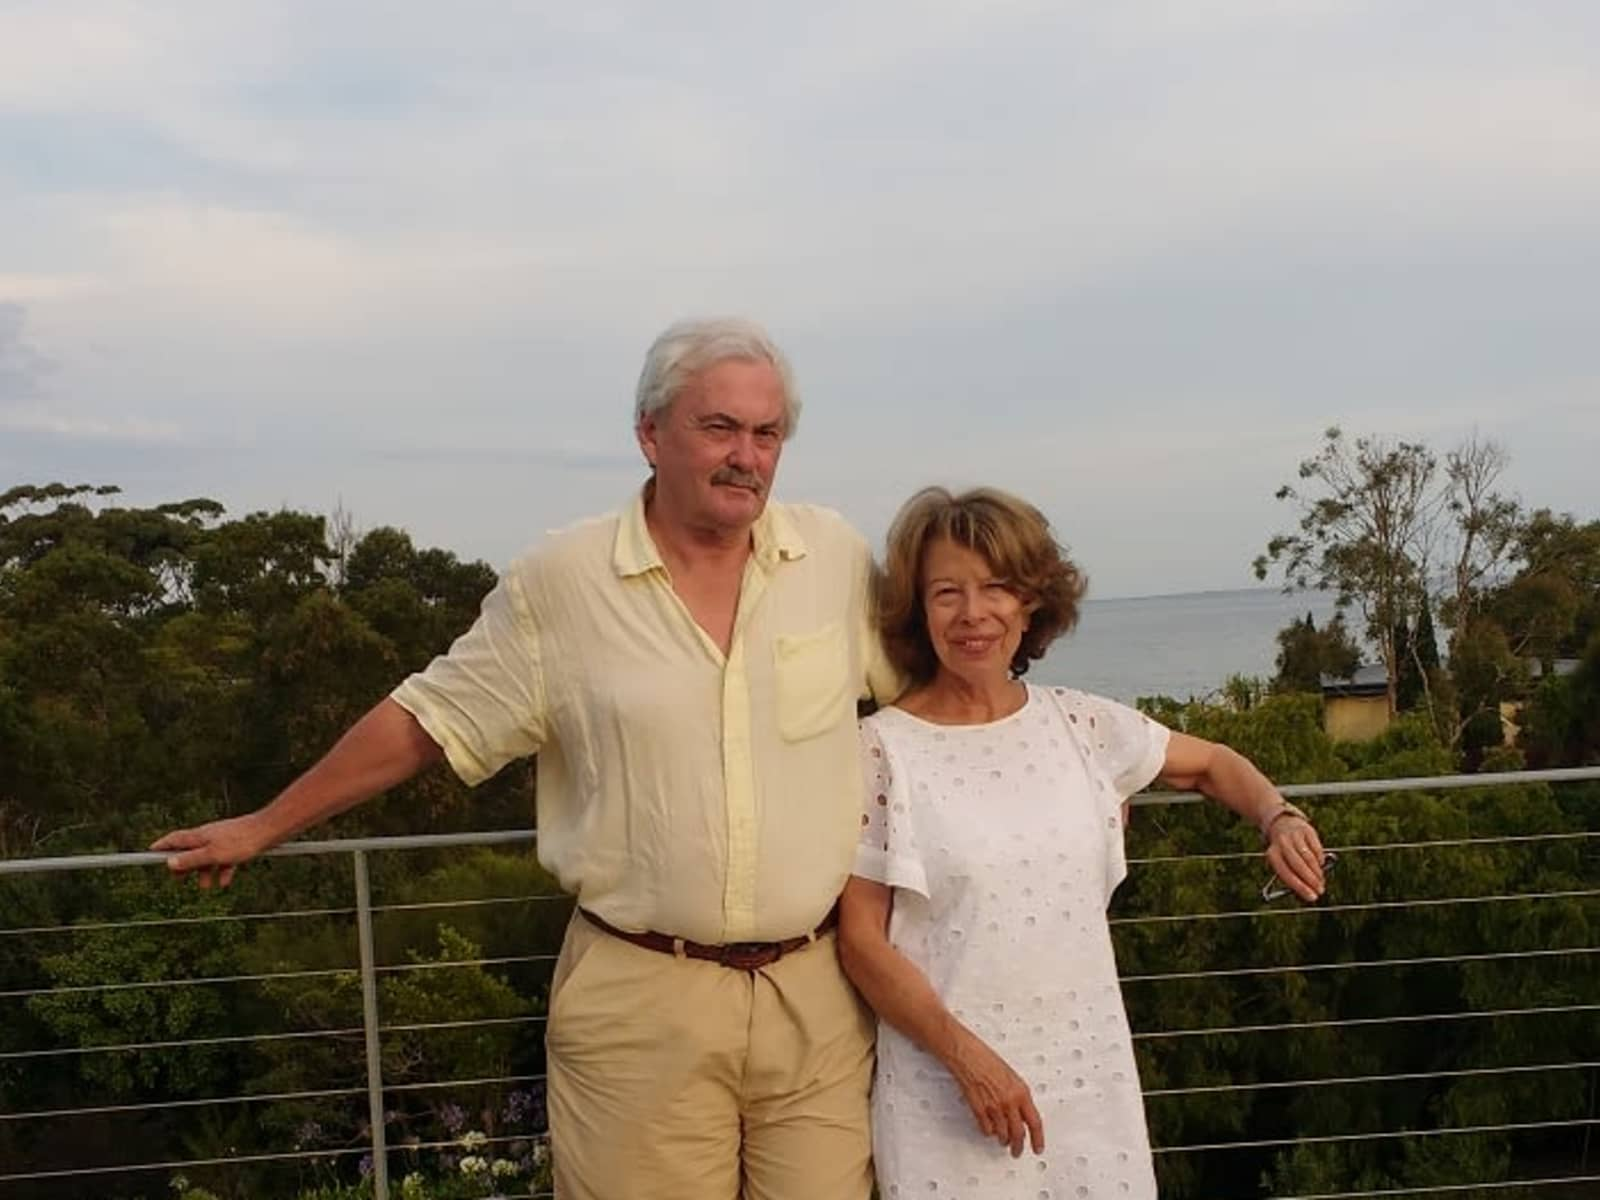 Jacqueline & Ronald from Brighton, Victoria, Australia